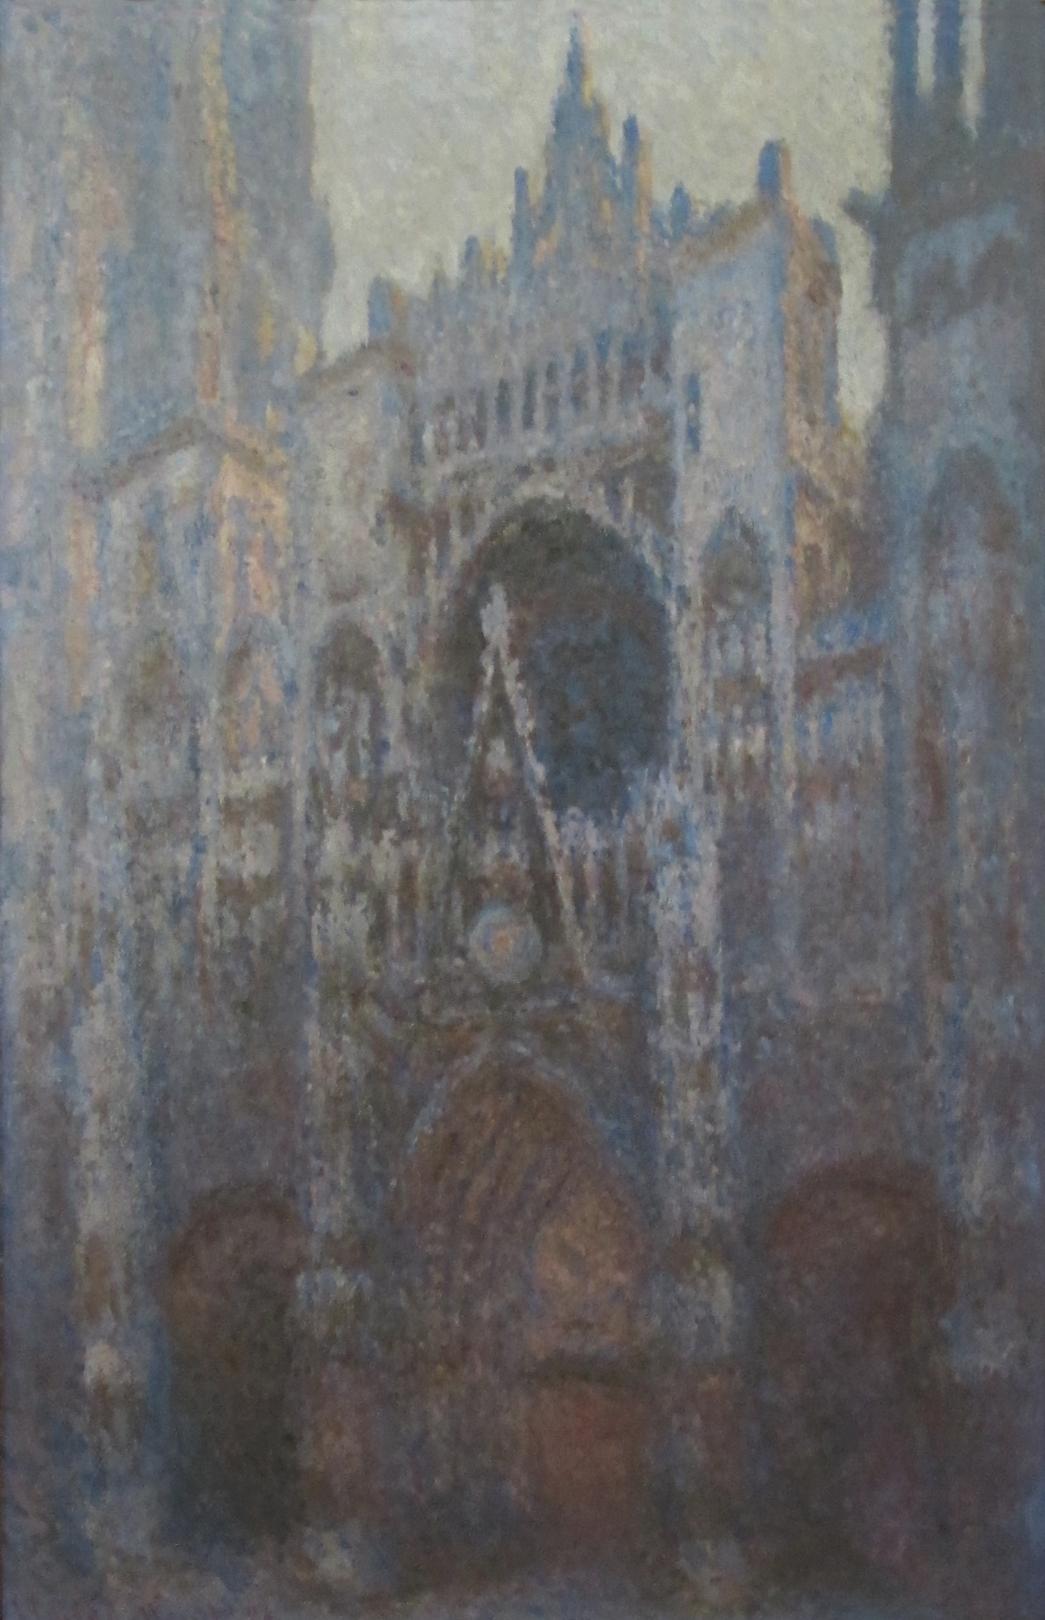 File:Monet, Cattedrale di Rouen, Weimar, 1894.jpg - Wikimedia Commons